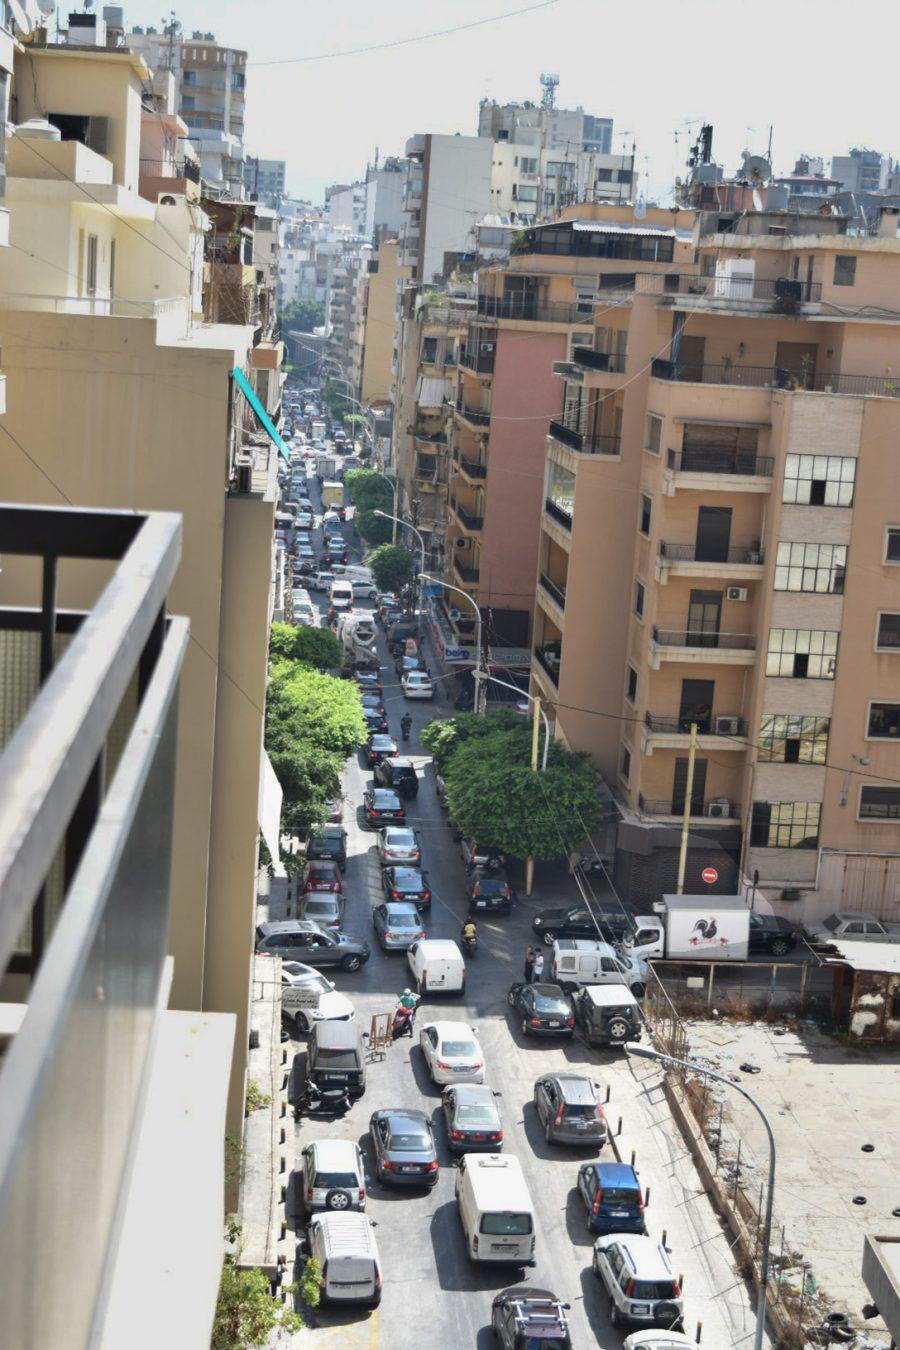 Lebanon, Long lines, gas stations